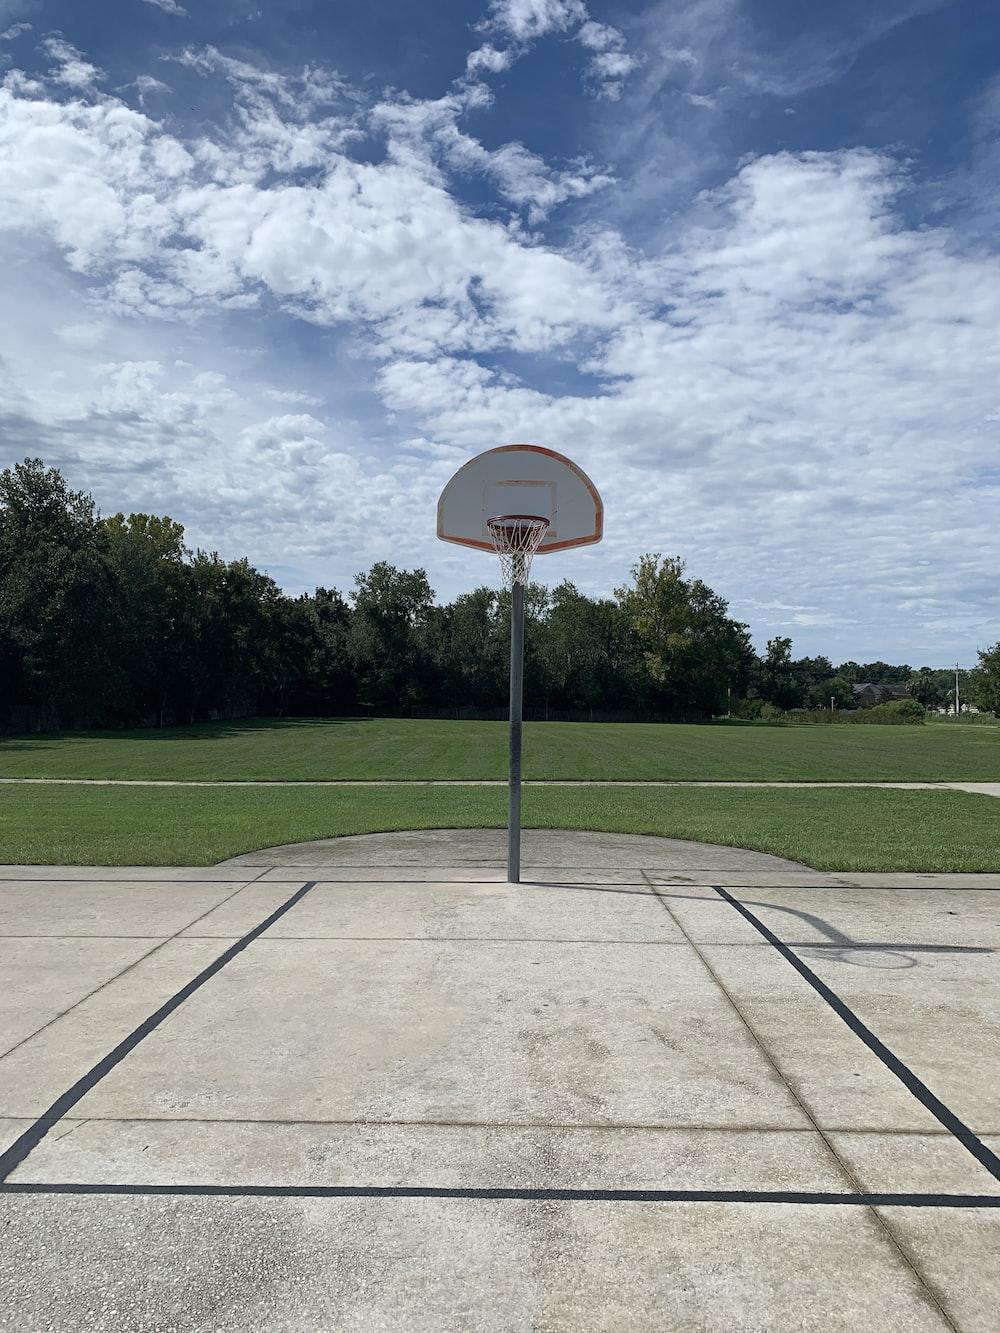 basketball hoop on green grass field under blue sky during daytime